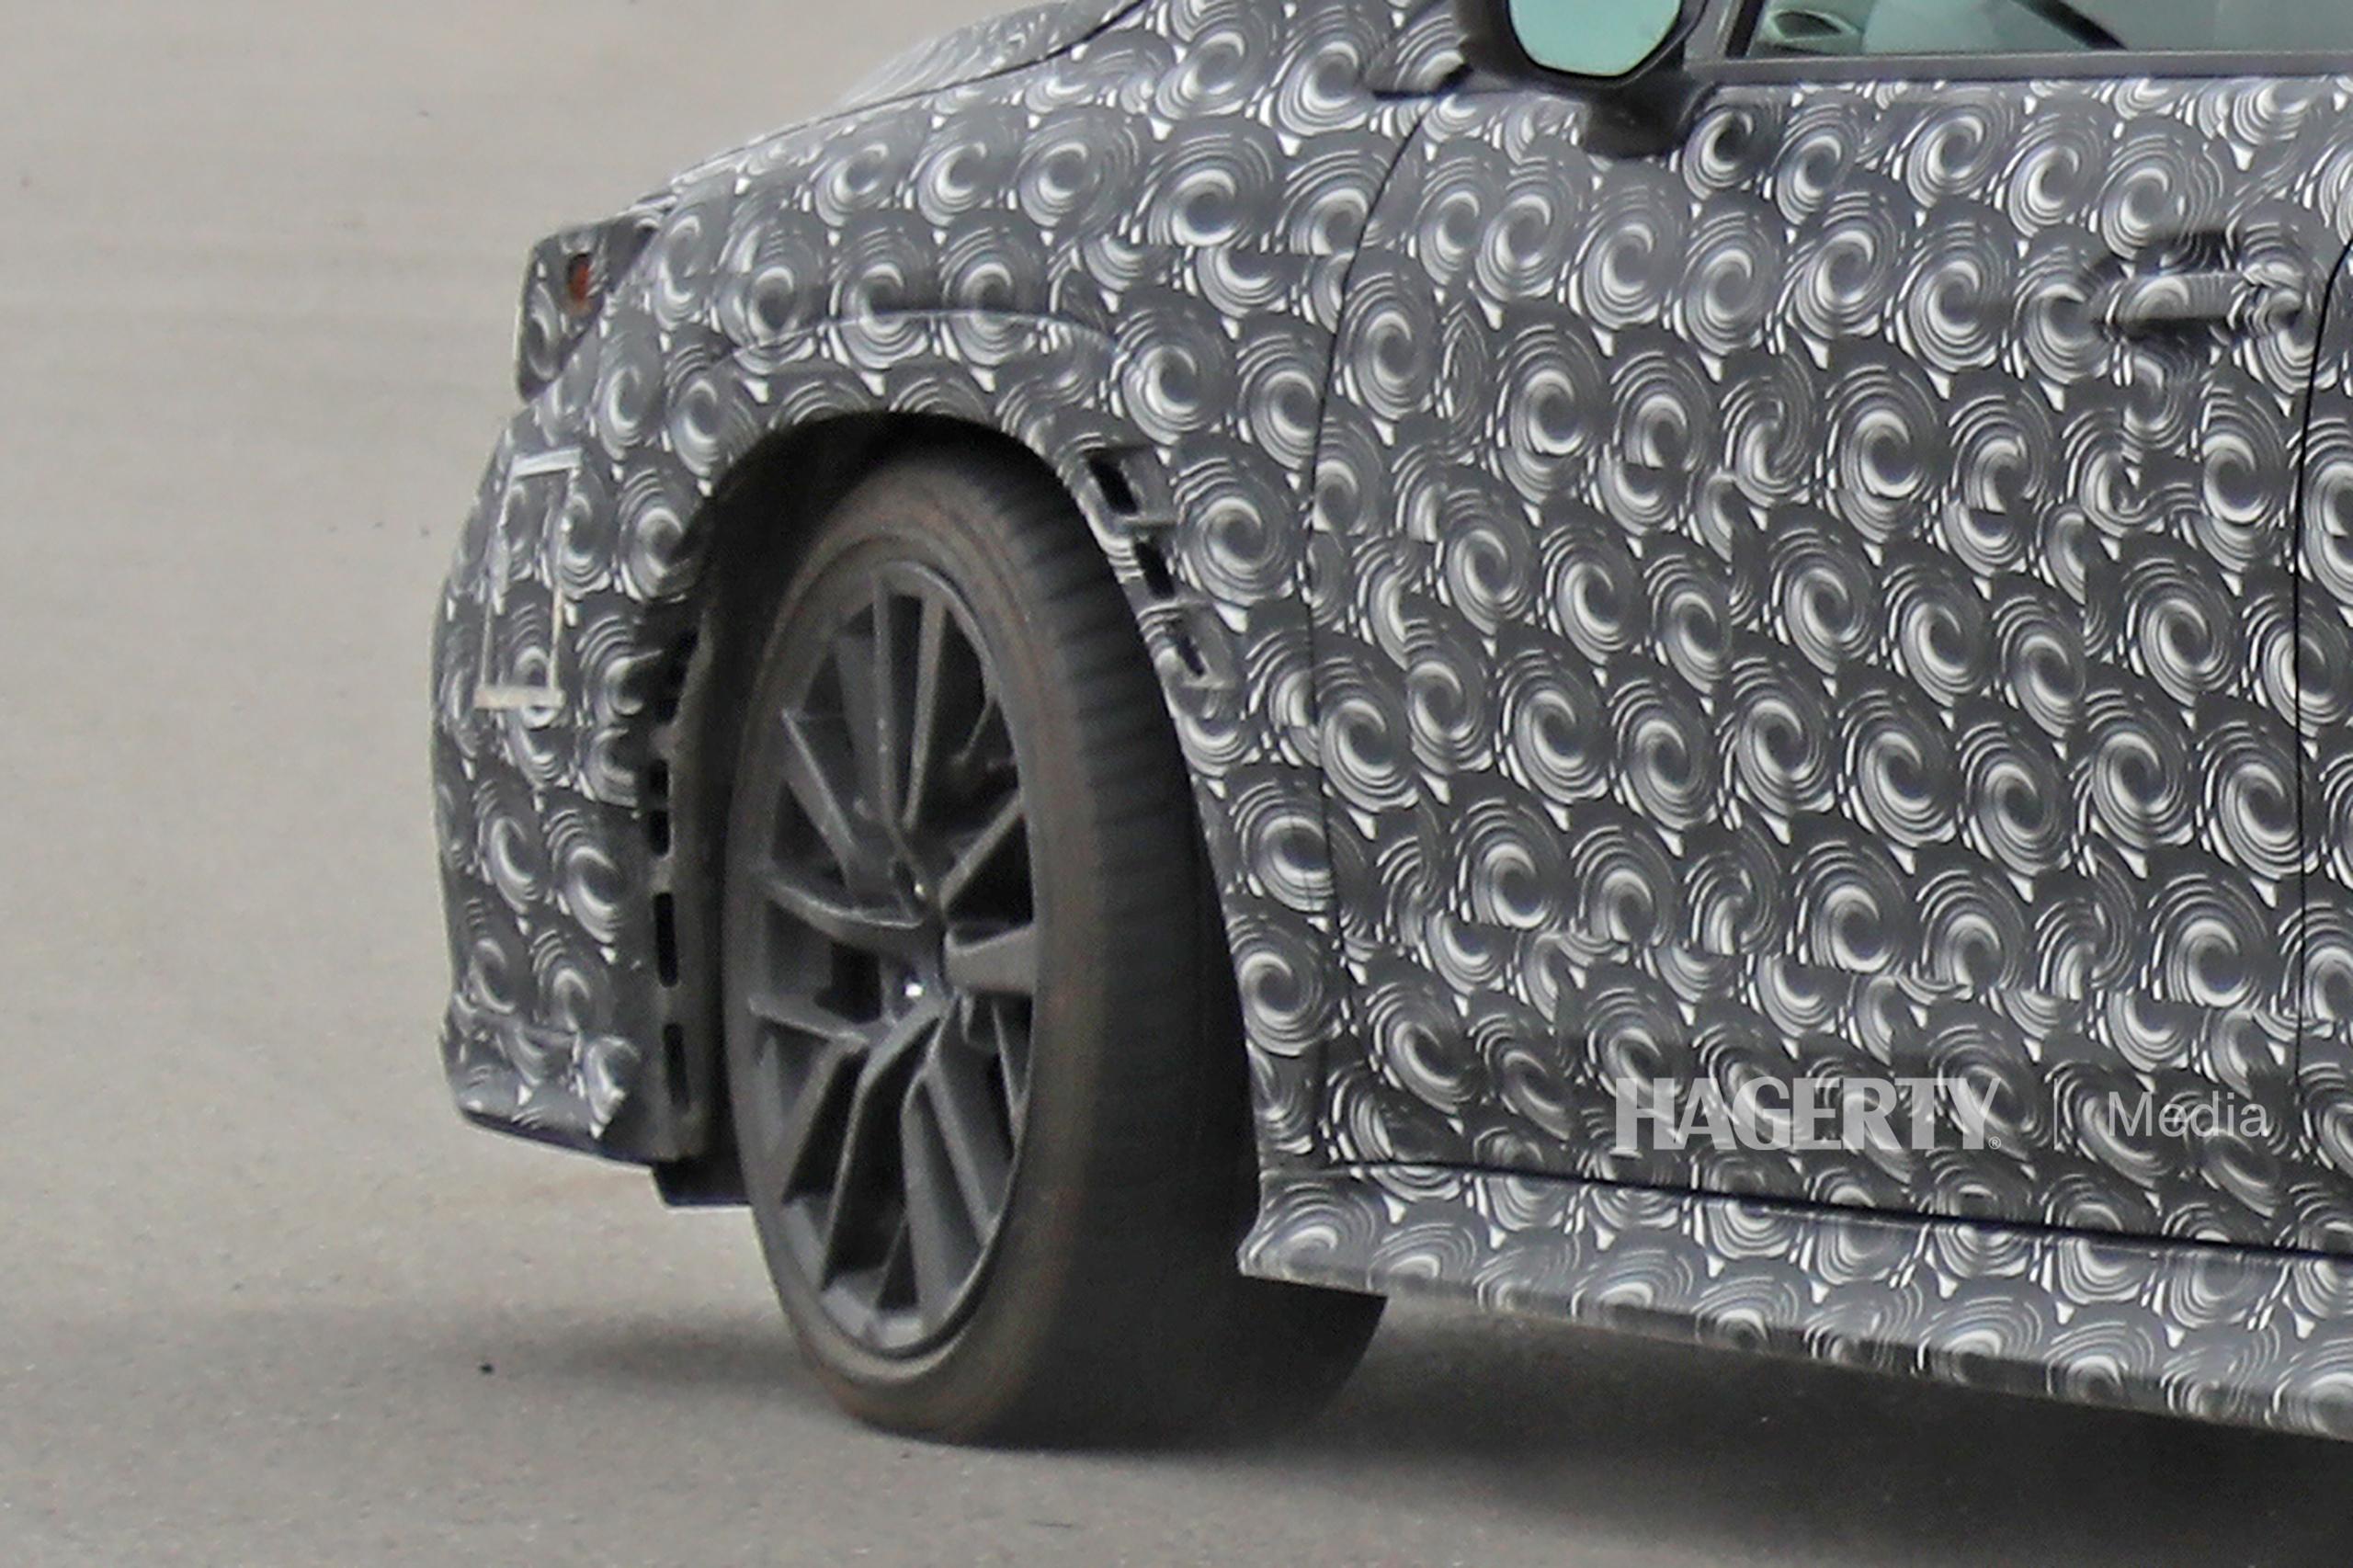 New Subaru WRX spy wheel close